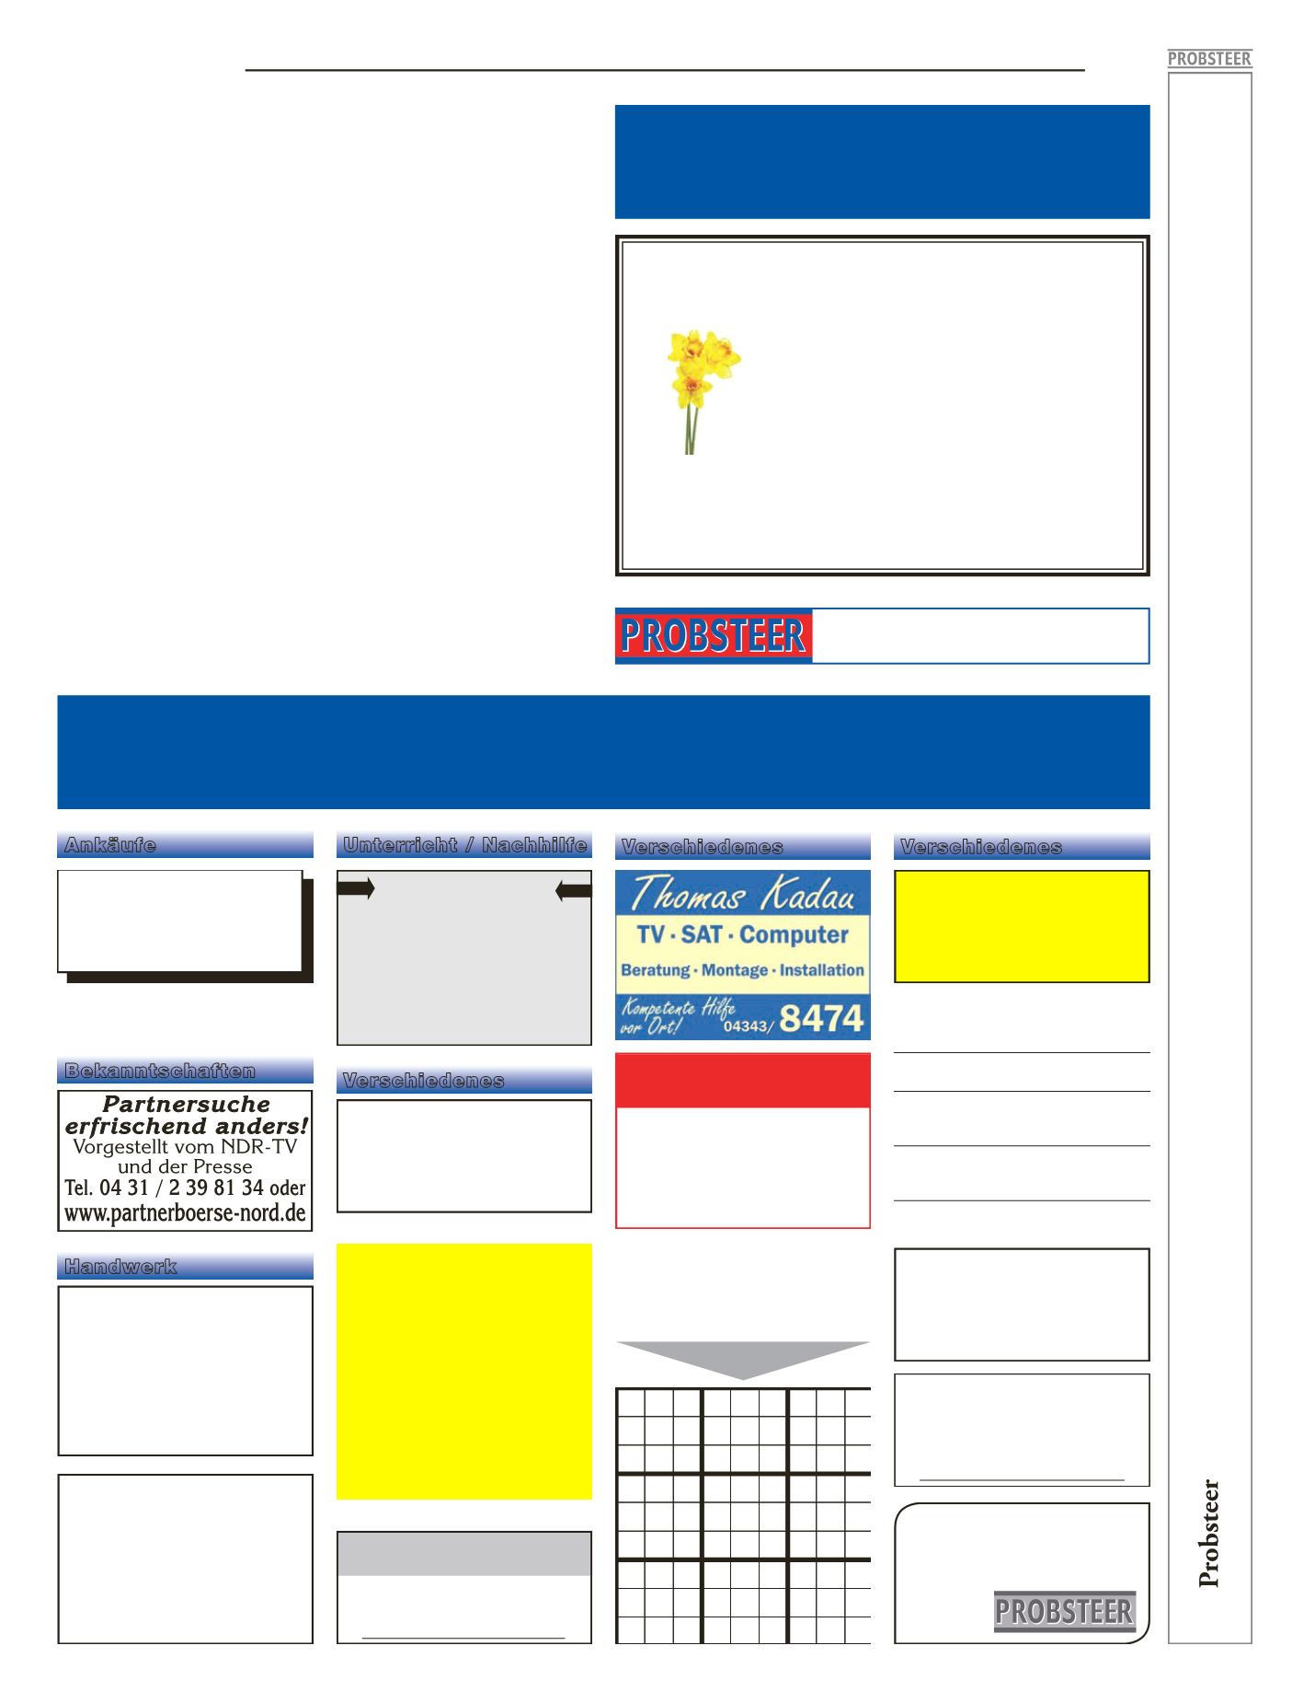 Partnerbörse-nord 24226 Heikendorf